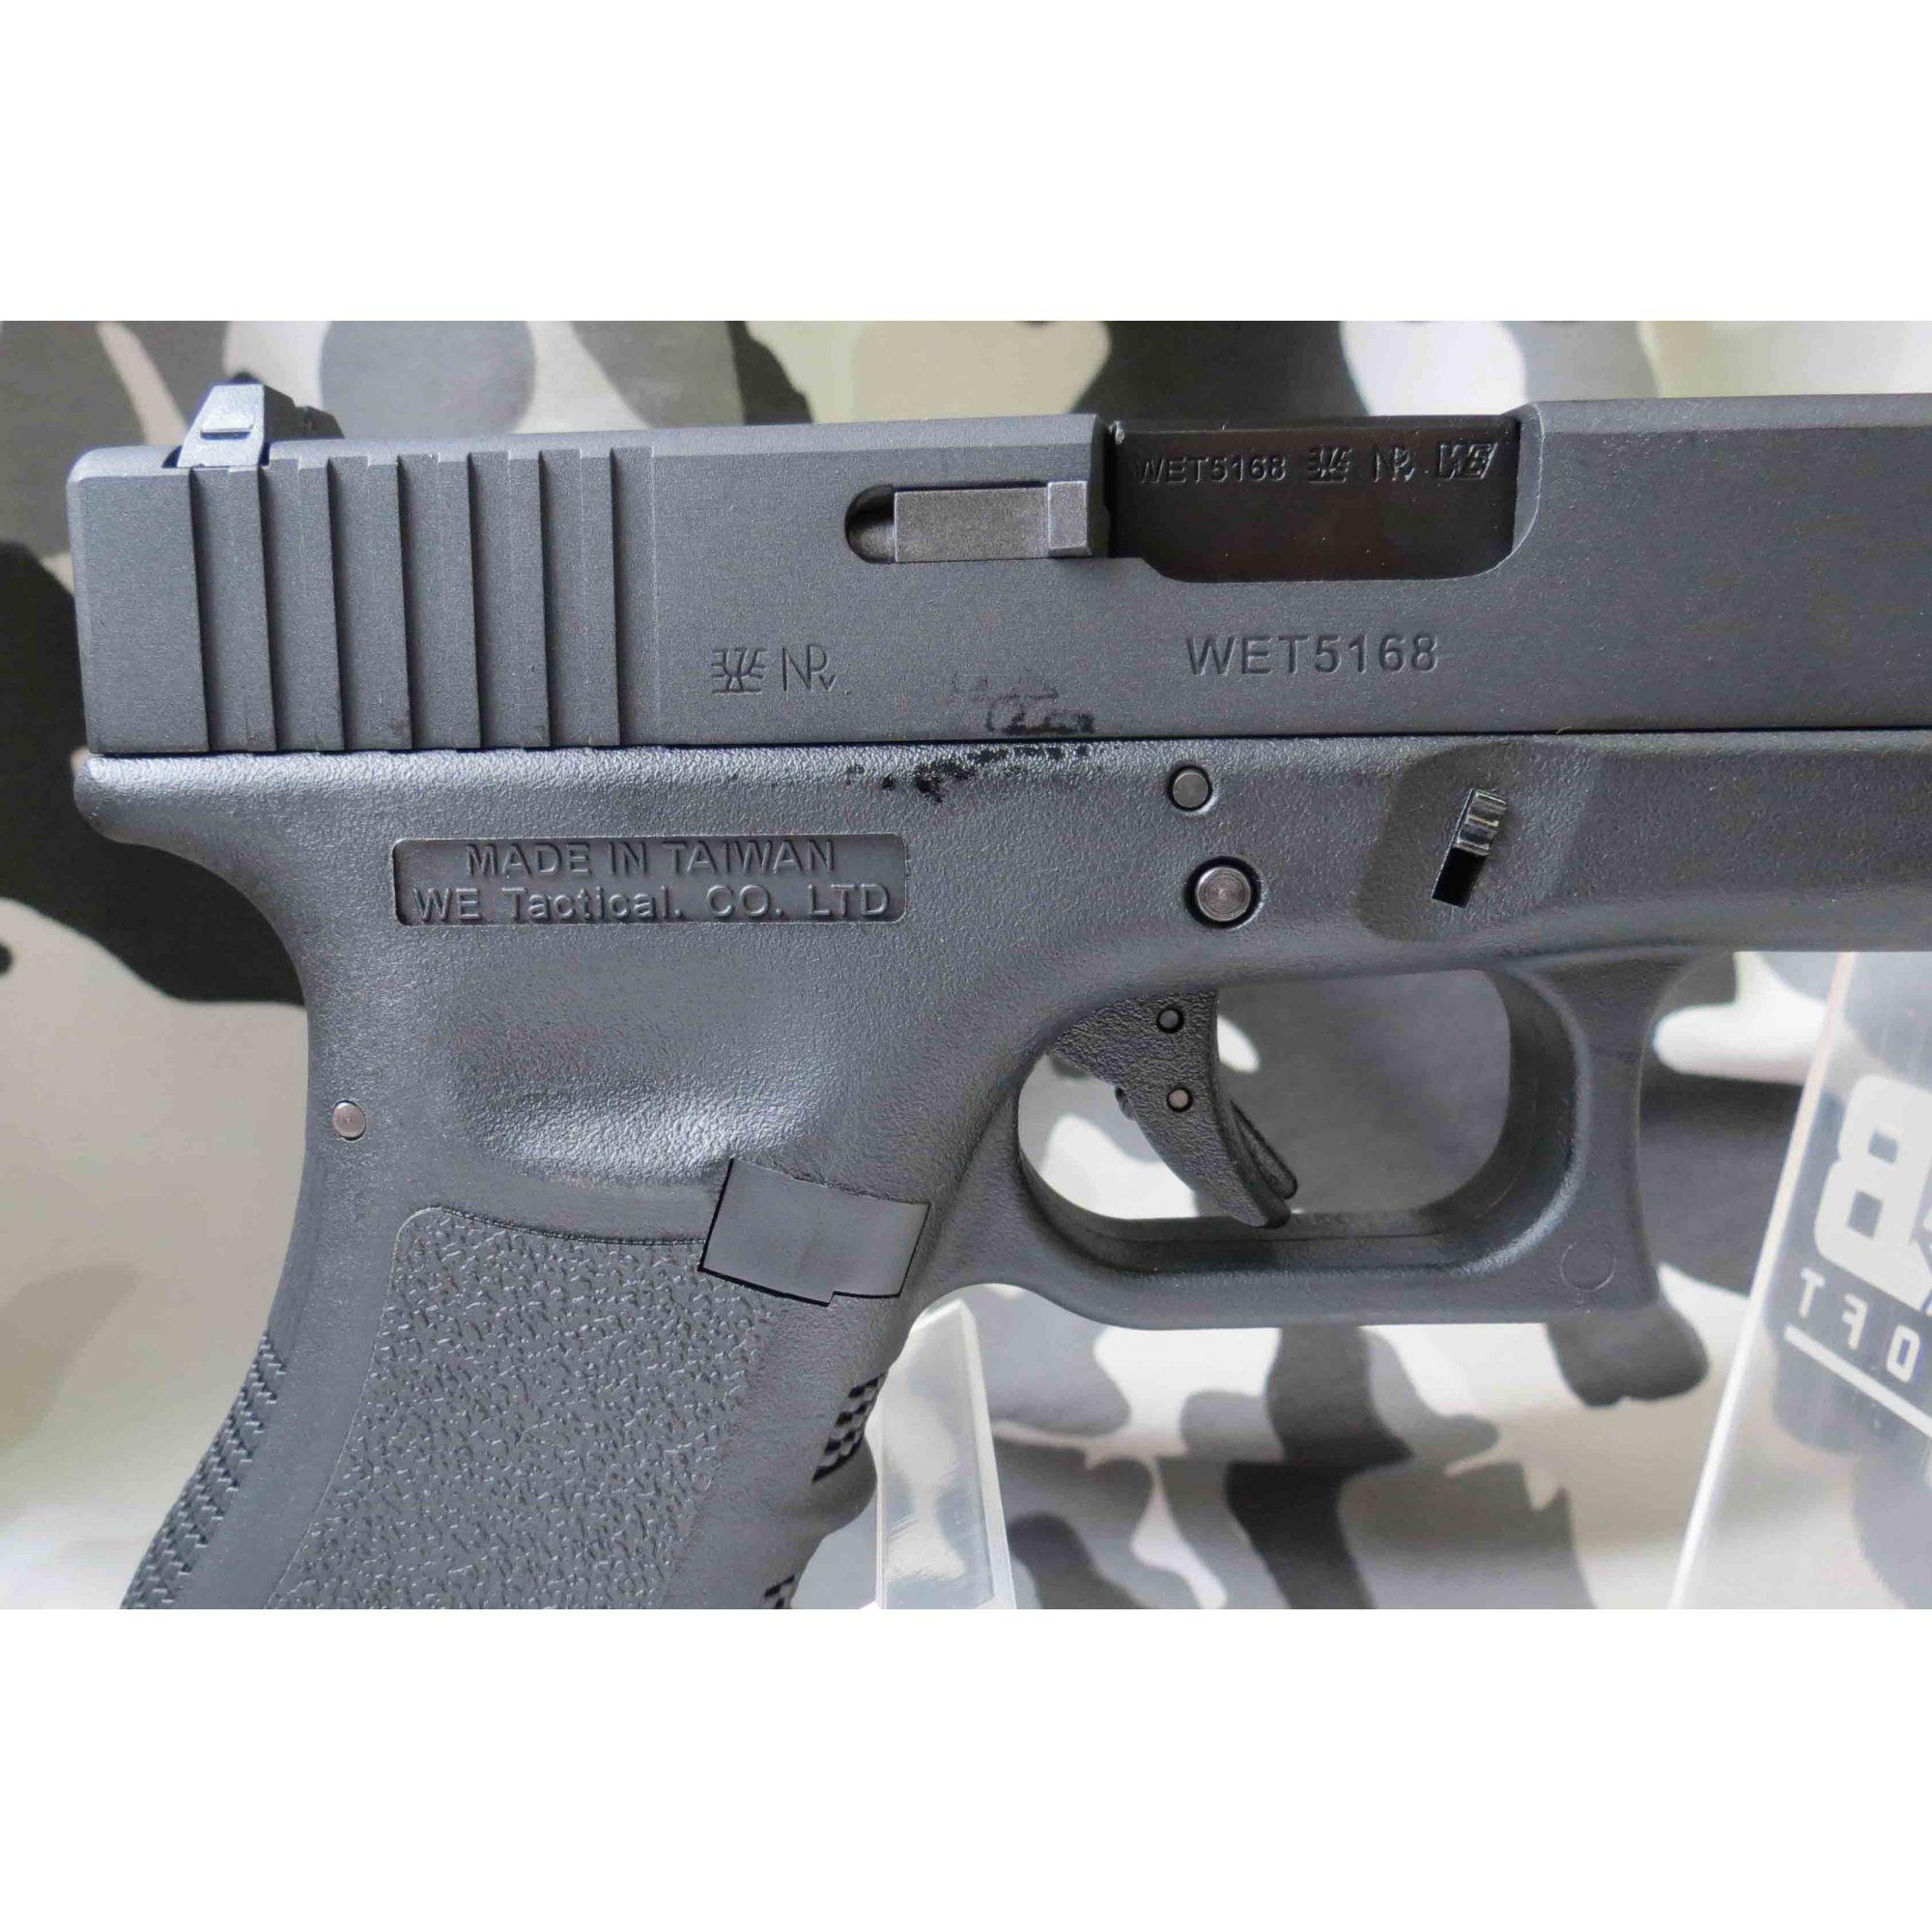 Pistola Airsoft WE Glock G18 Gen 3 GBB Metal e Polimero Preta - Calibre 6 mm  - MAB AIRSOFT